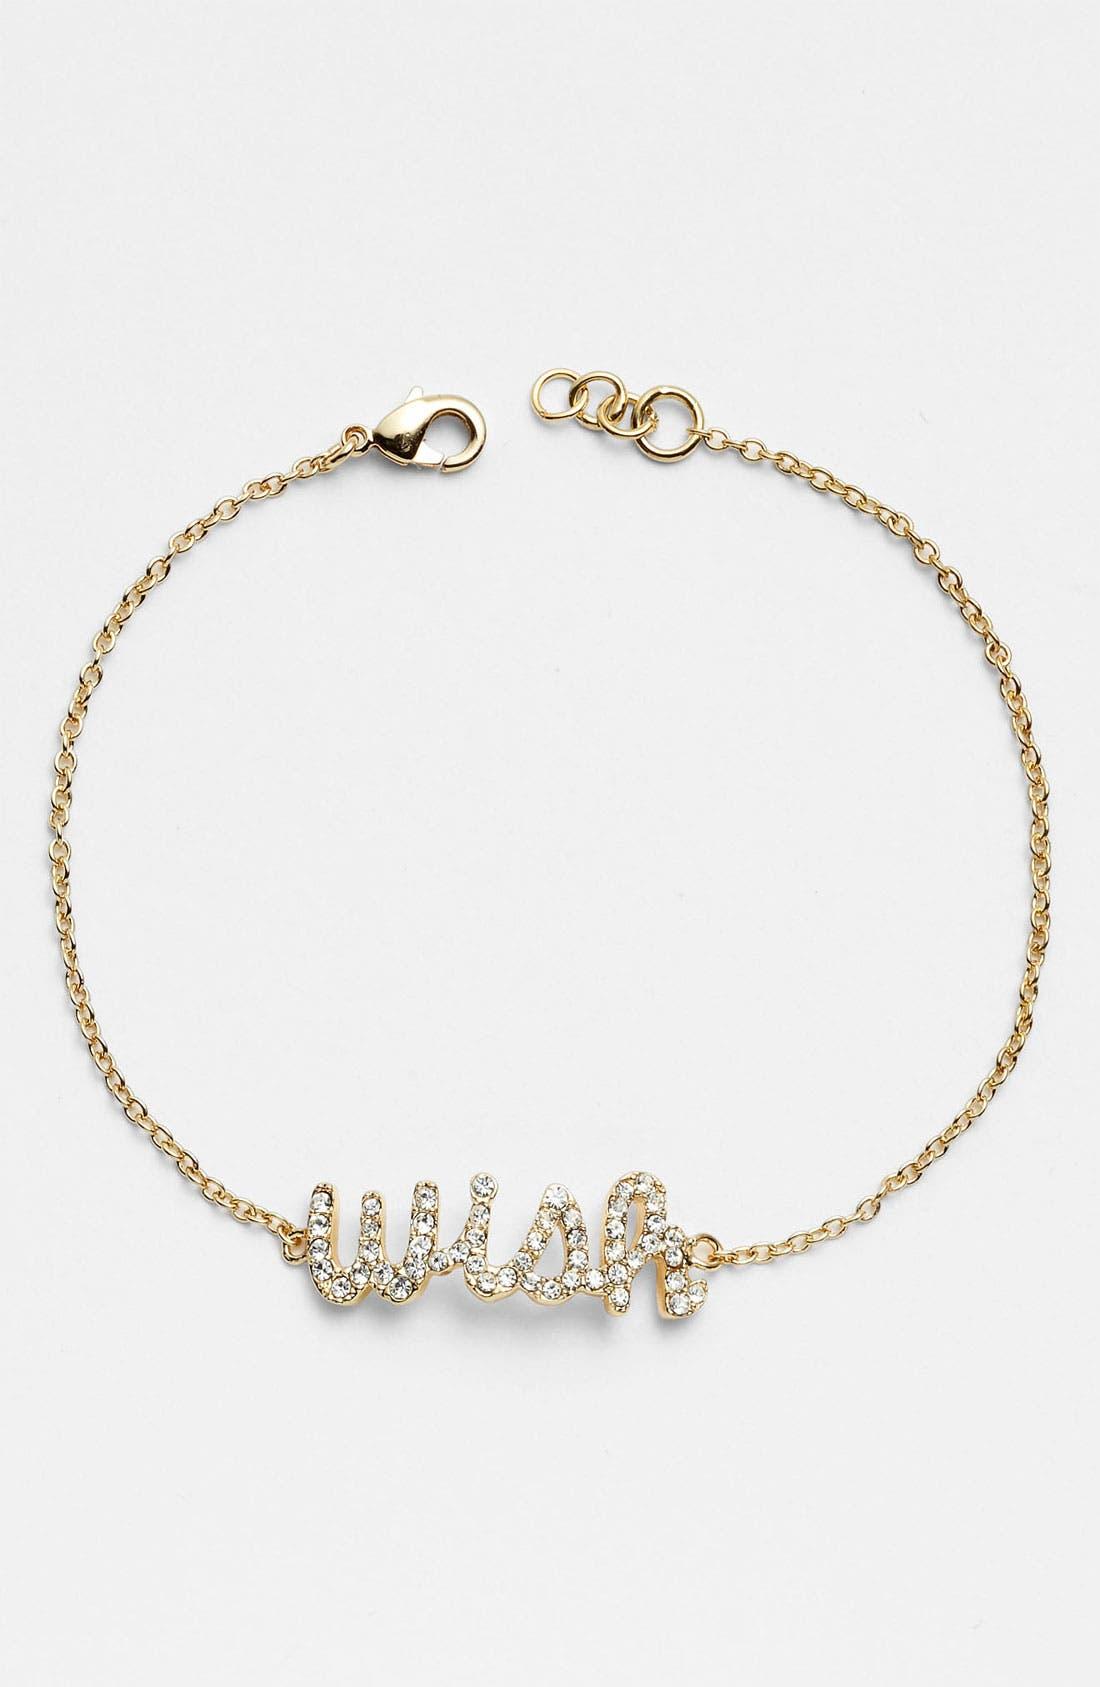 Main Image - Ariella Collection 'Messages - Wish' Script Station Bracelet